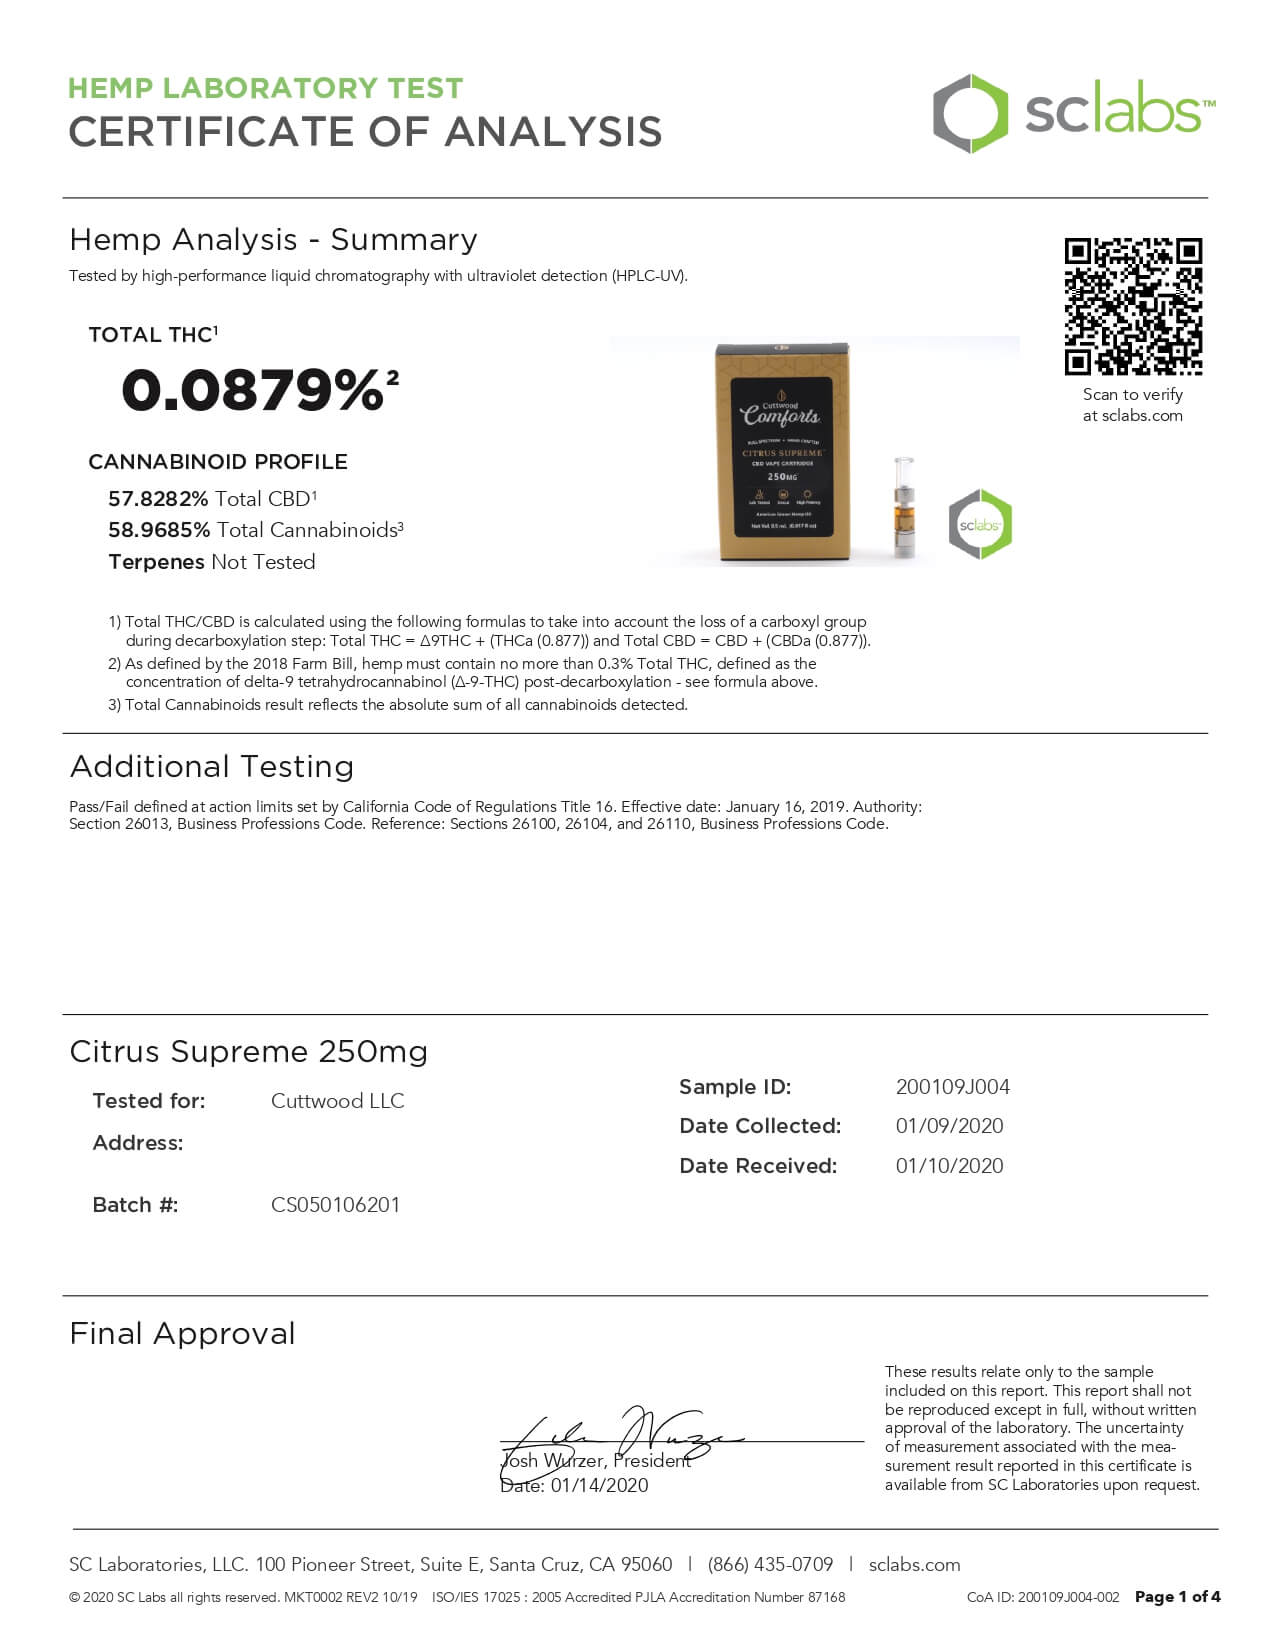 Cuttwood Comforts CBD Vape Cartridge Full Spectrum Citrus Supreme 250mg Lab Report